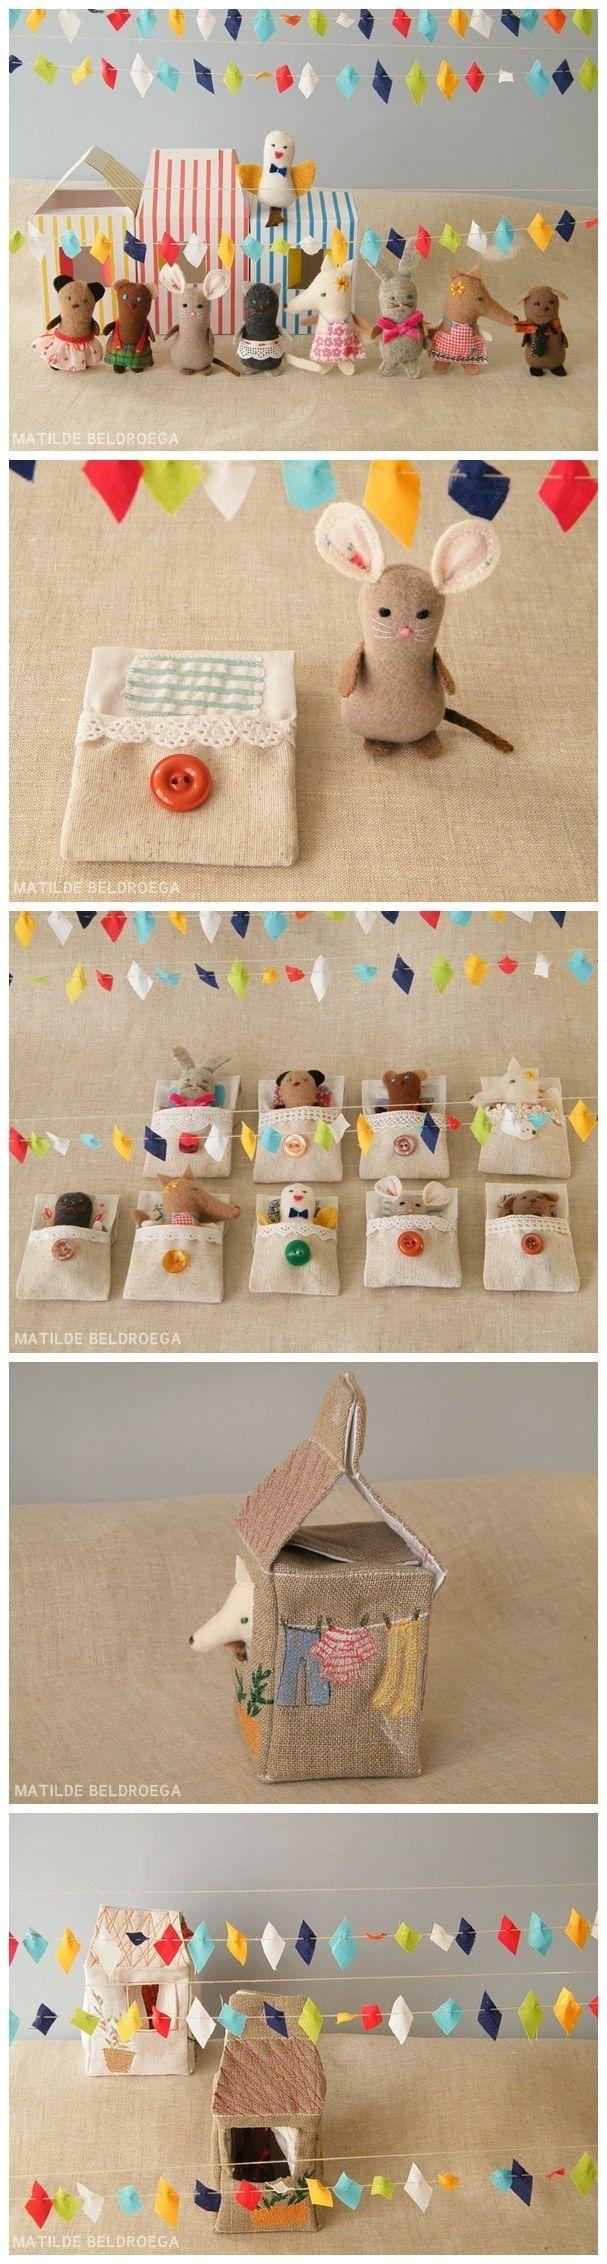 Adorable softies toys ~ Sleepover party ~ Matilde Beldroega by Rita Pinheiro